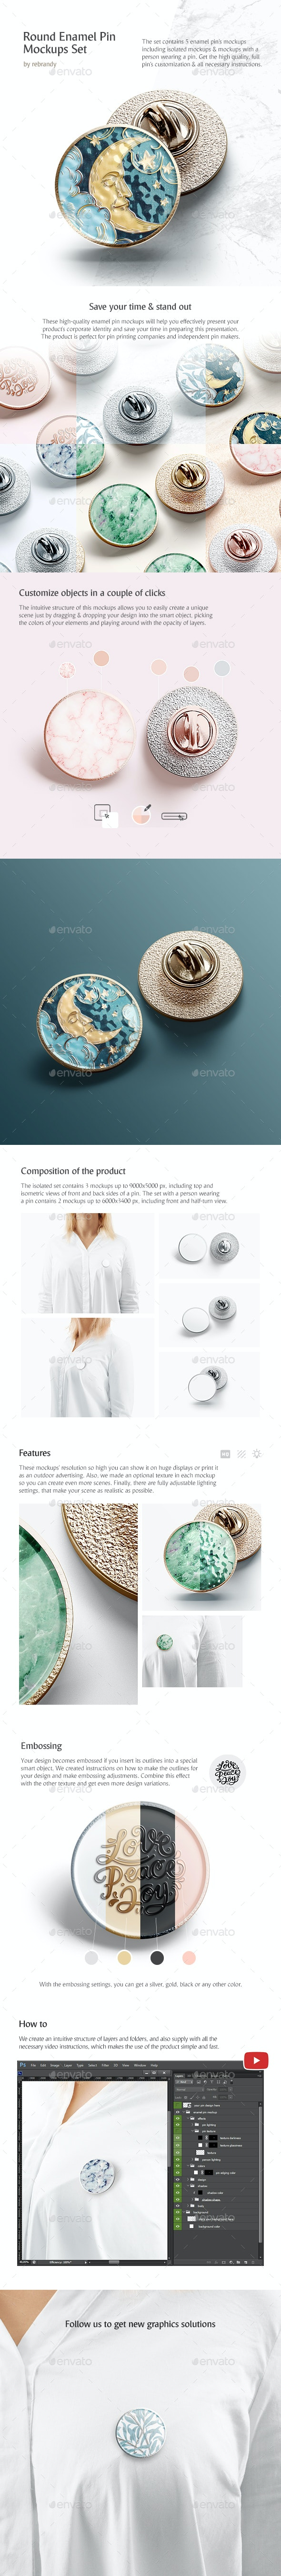 Round Enamel Pin Mockups Set - Product Mock-Ups Graphics